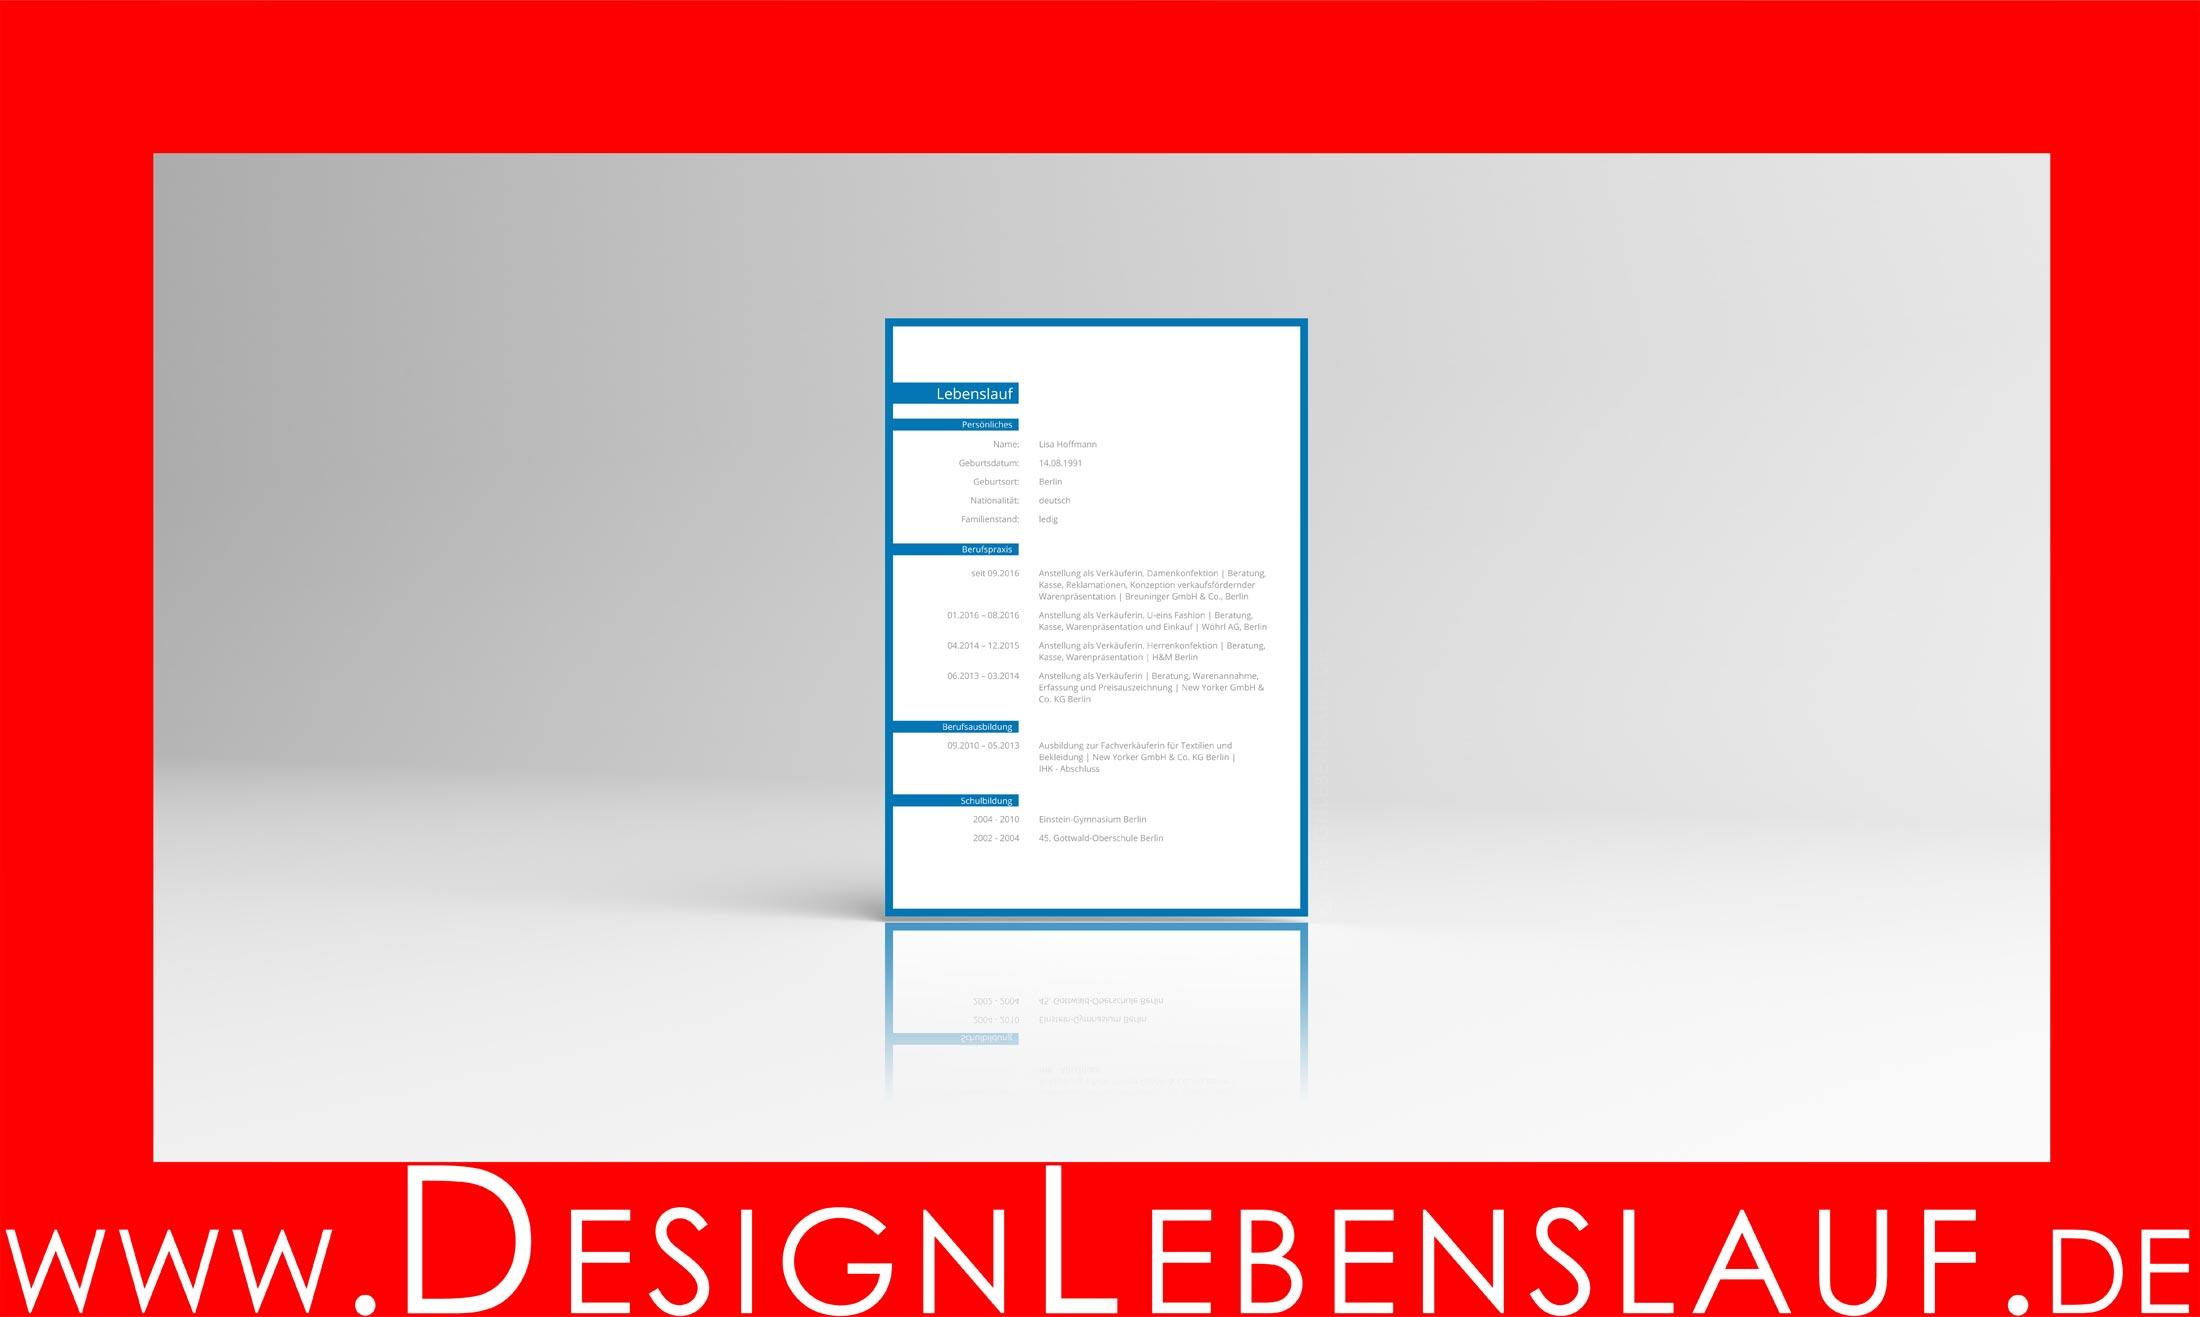 lebenslauf muster download f r word und open office. Black Bedroom Furniture Sets. Home Design Ideas